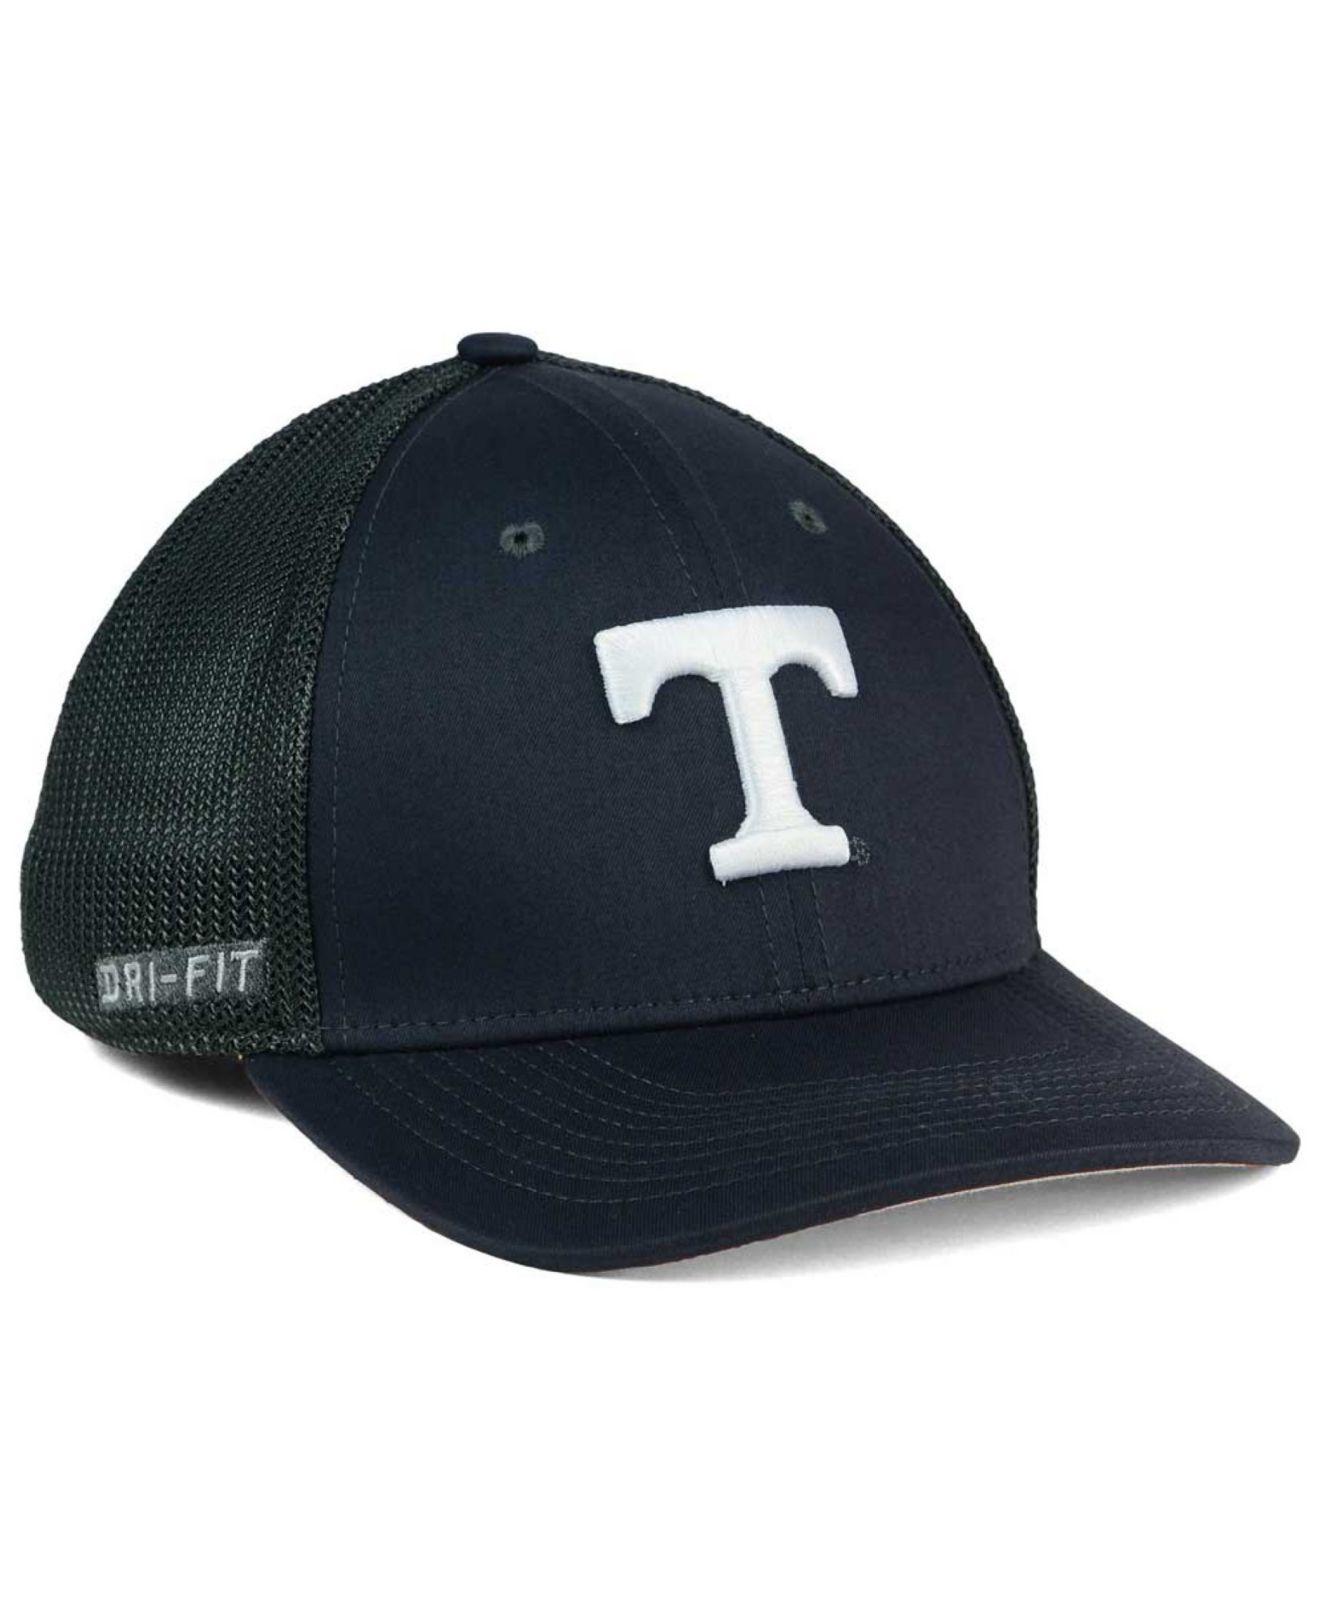 3c59bae40b0 Lyst - Nike Tennessee Volunteers L91 Mesh Swoosh Flex Cap in Black ...